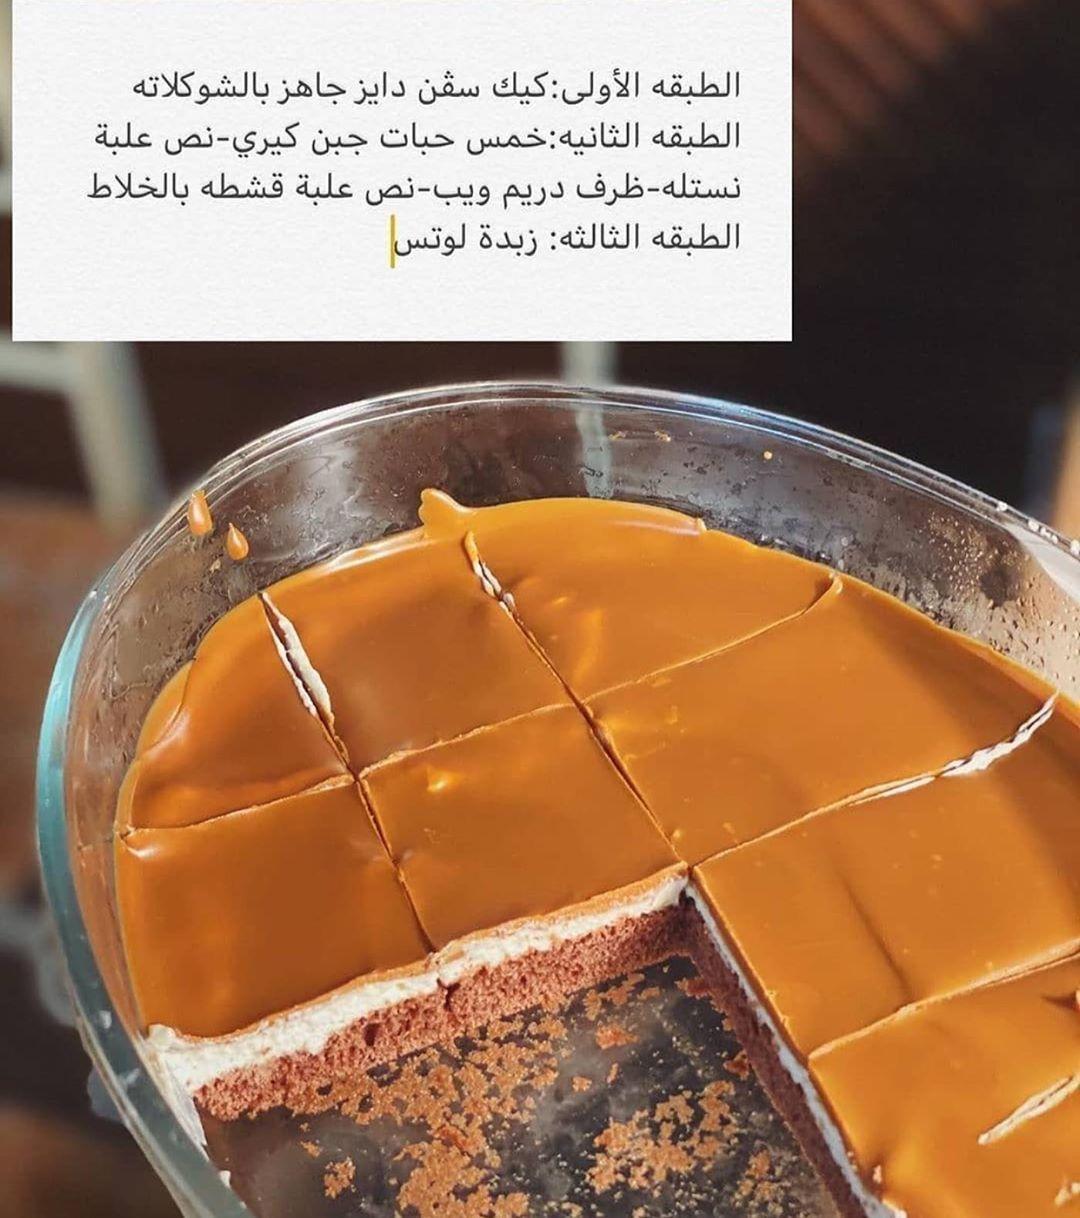 Pin By Amamari On حلا Yummy Food Dessert Food Videos Desserts Food Drinks Dessert